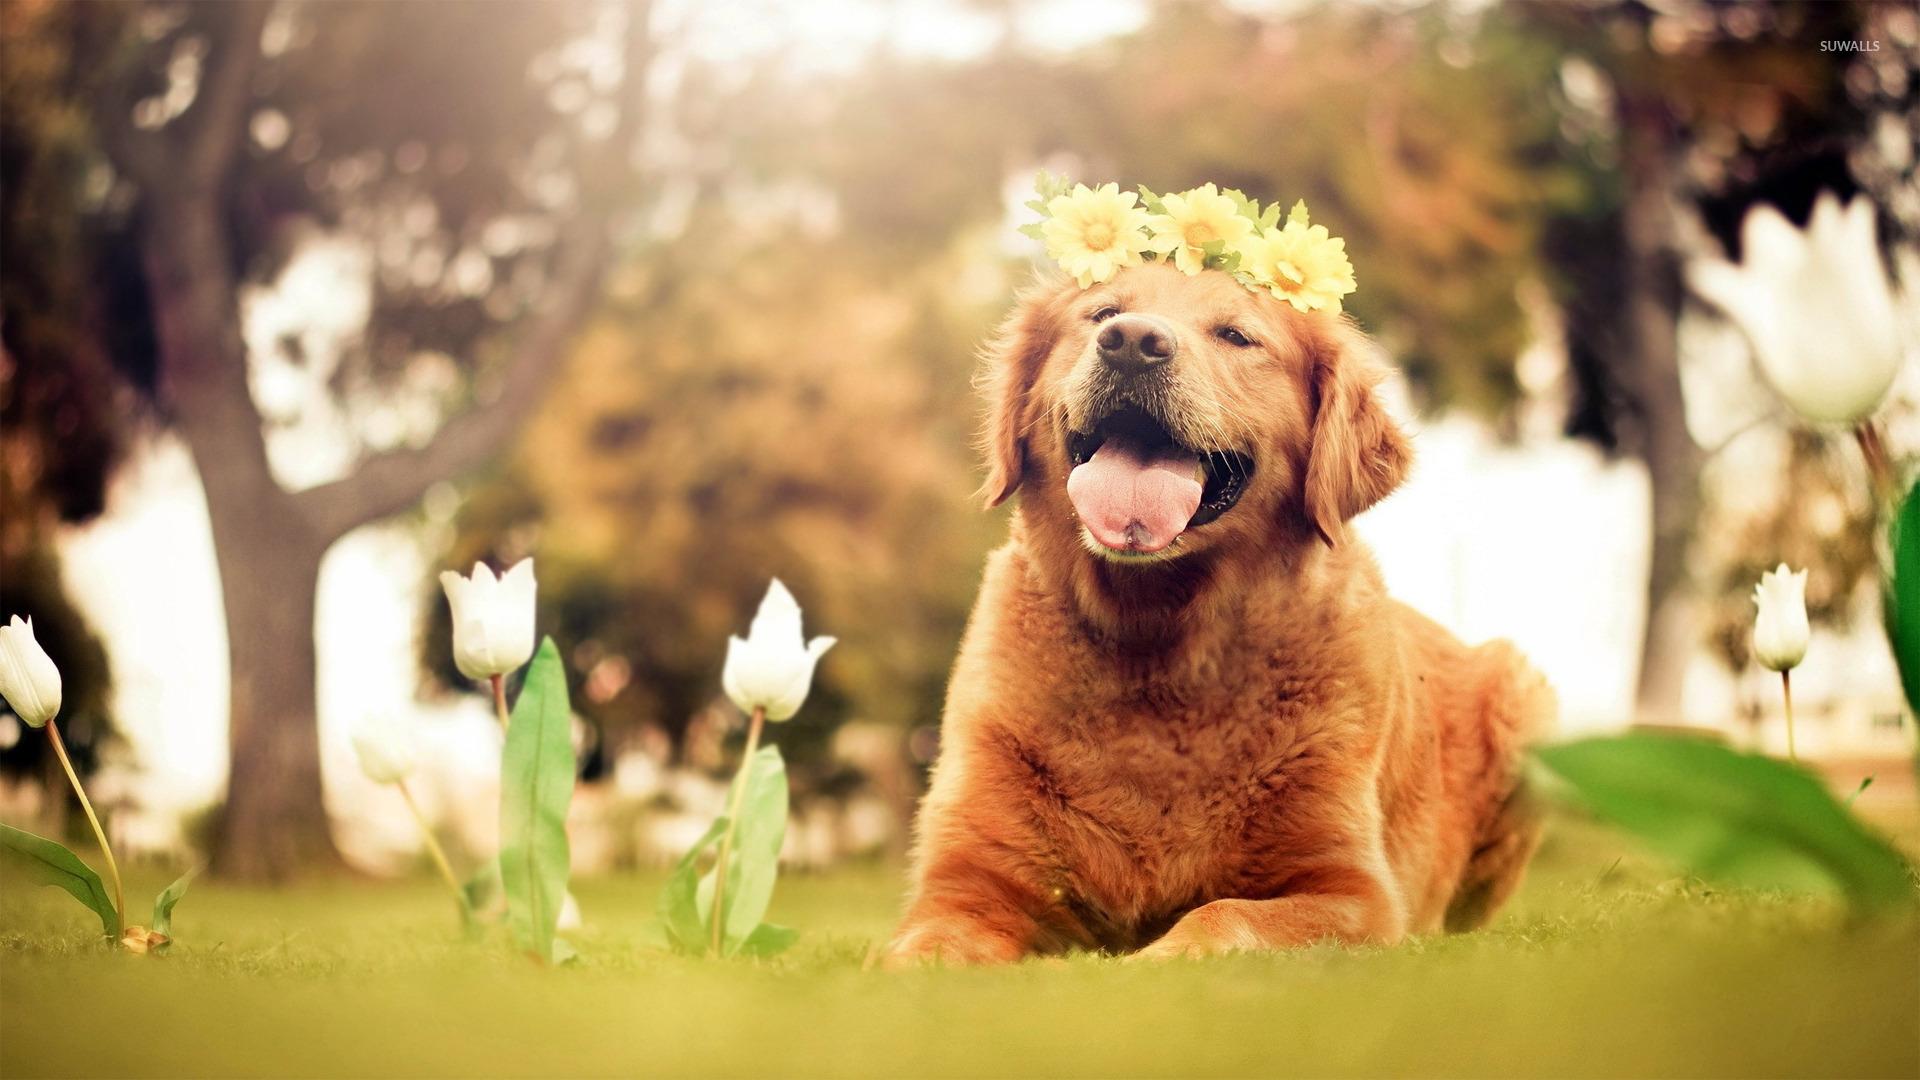 Free Download Golden Retriever Puppy Wallpaper Animal